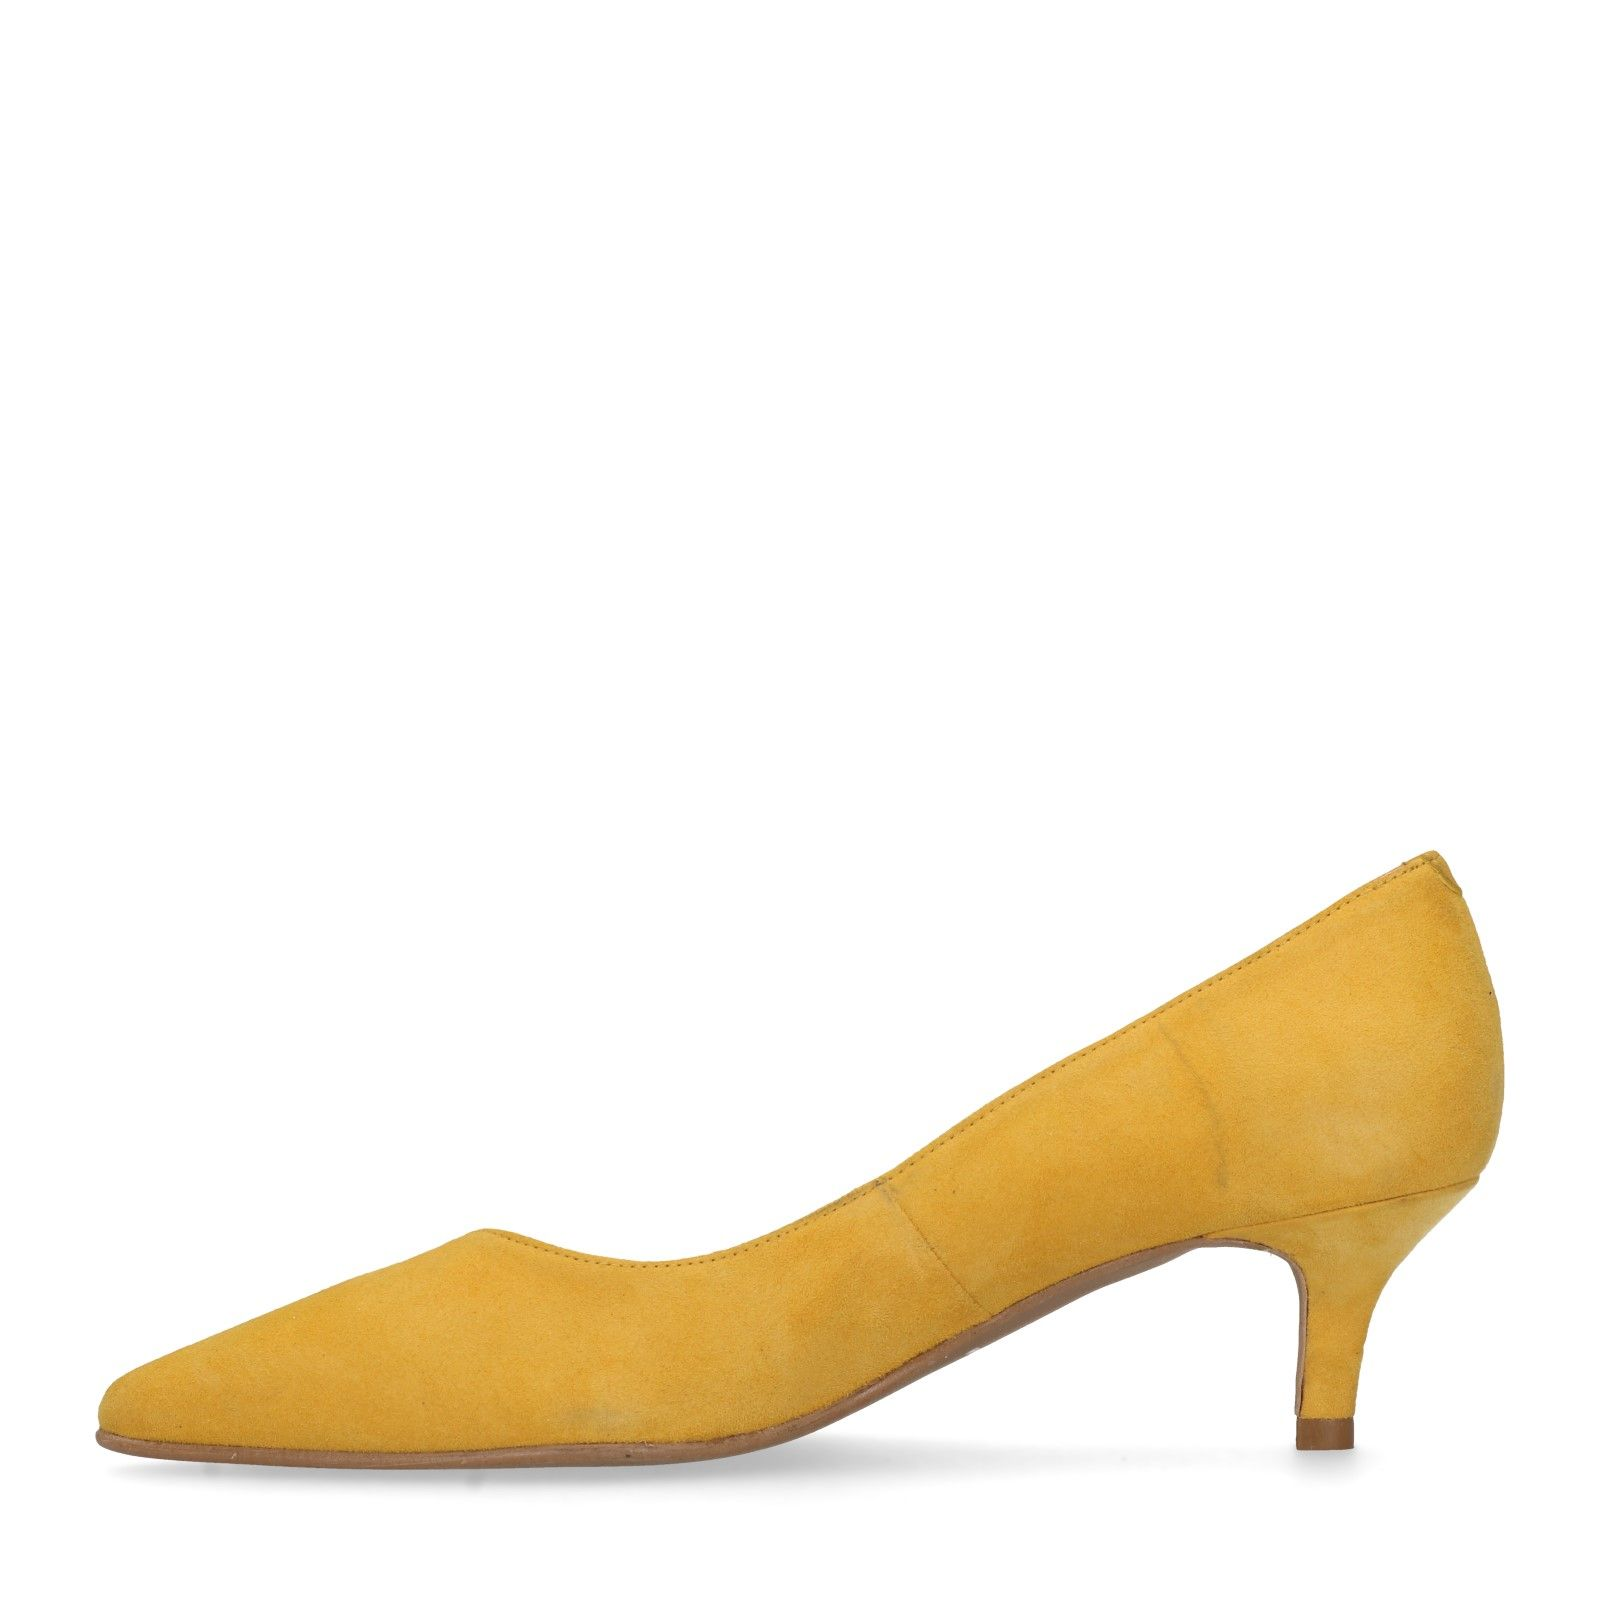 Sacha Escarpins en daim avec petit talon jaune